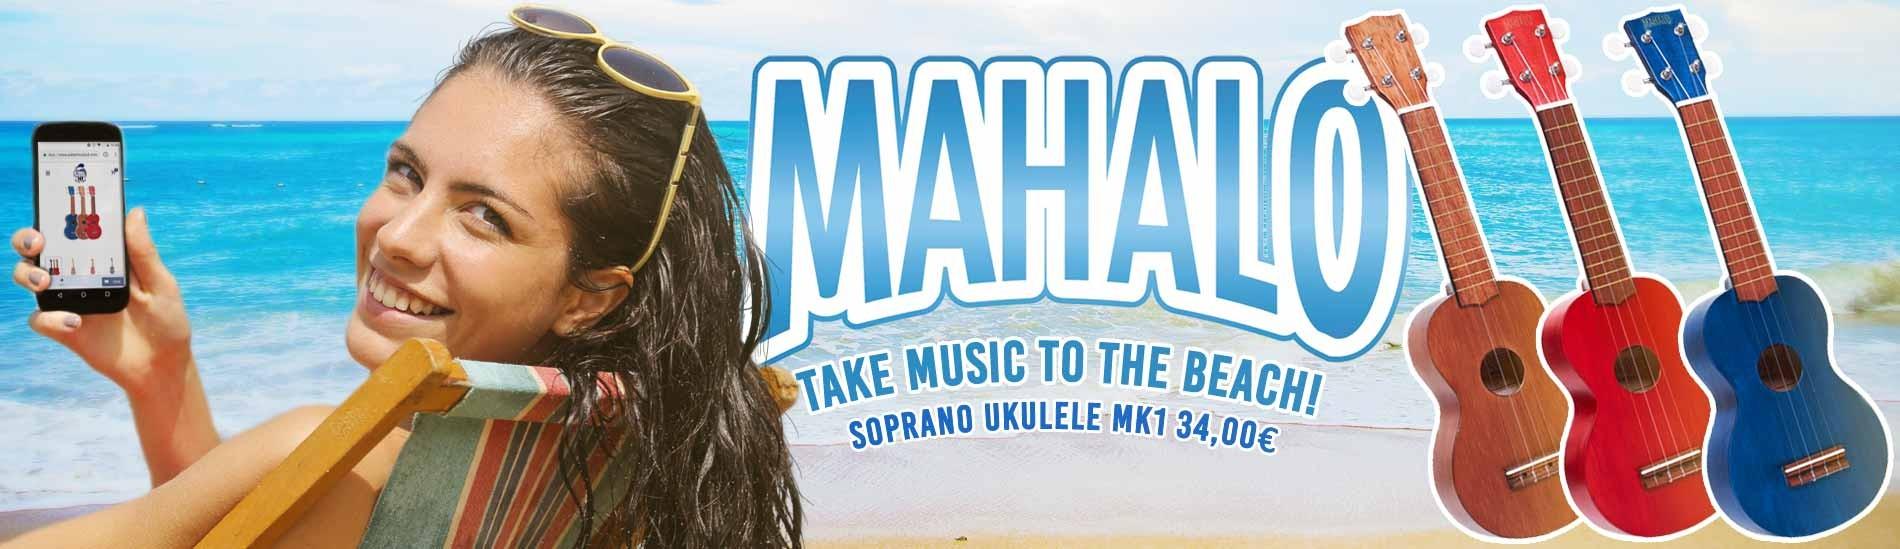 Mahalo Soprano Ukulele MK1 - Take music to the beach!